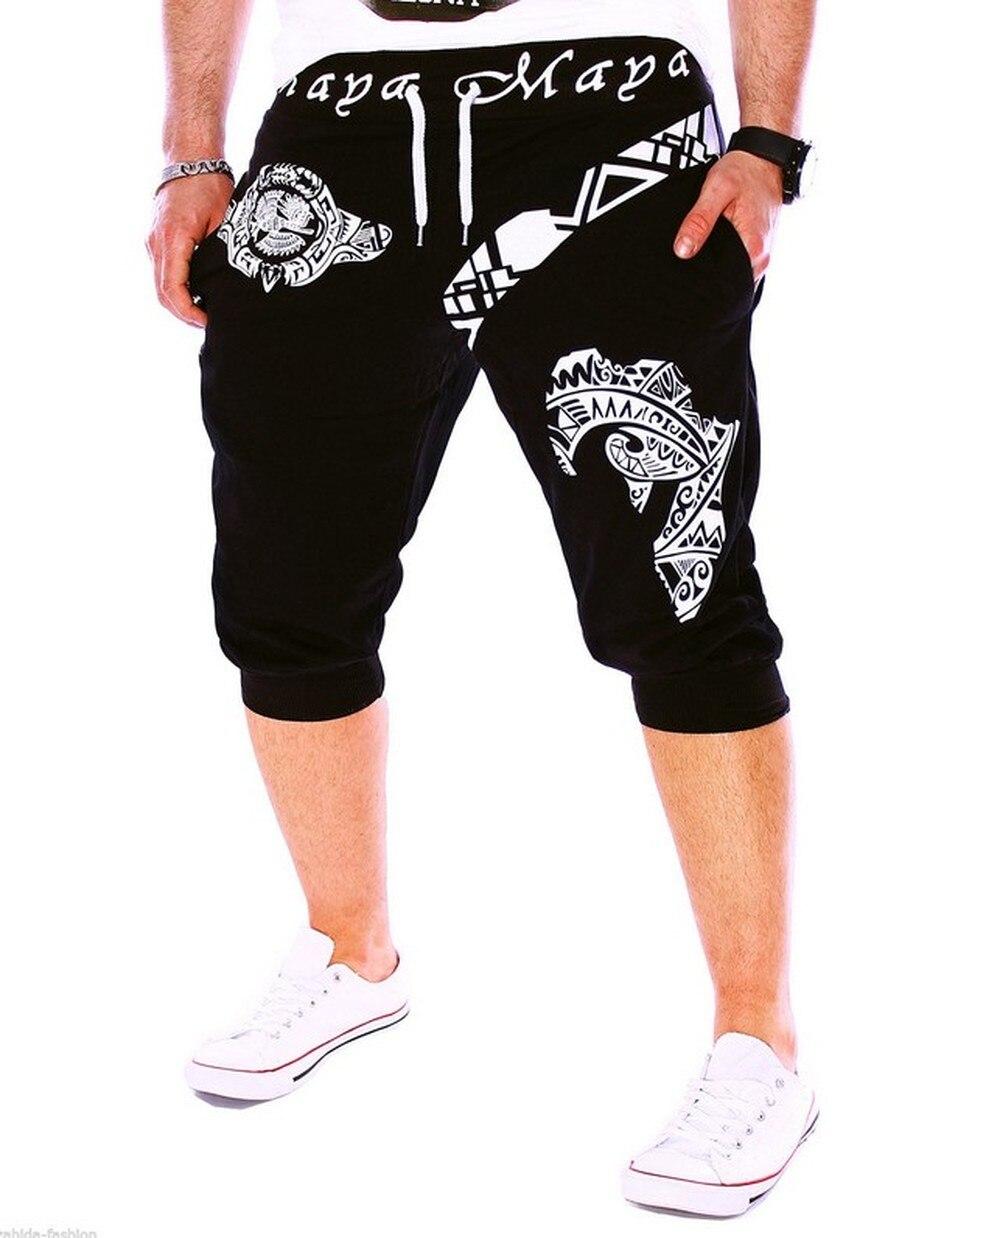 Фото - ZOGAA Men Summer Casual Slim Harlan Shorts Fashion Italian Print Design Fitness Cropped shortsCotton Tights Sports Casual Shorts italian interior design